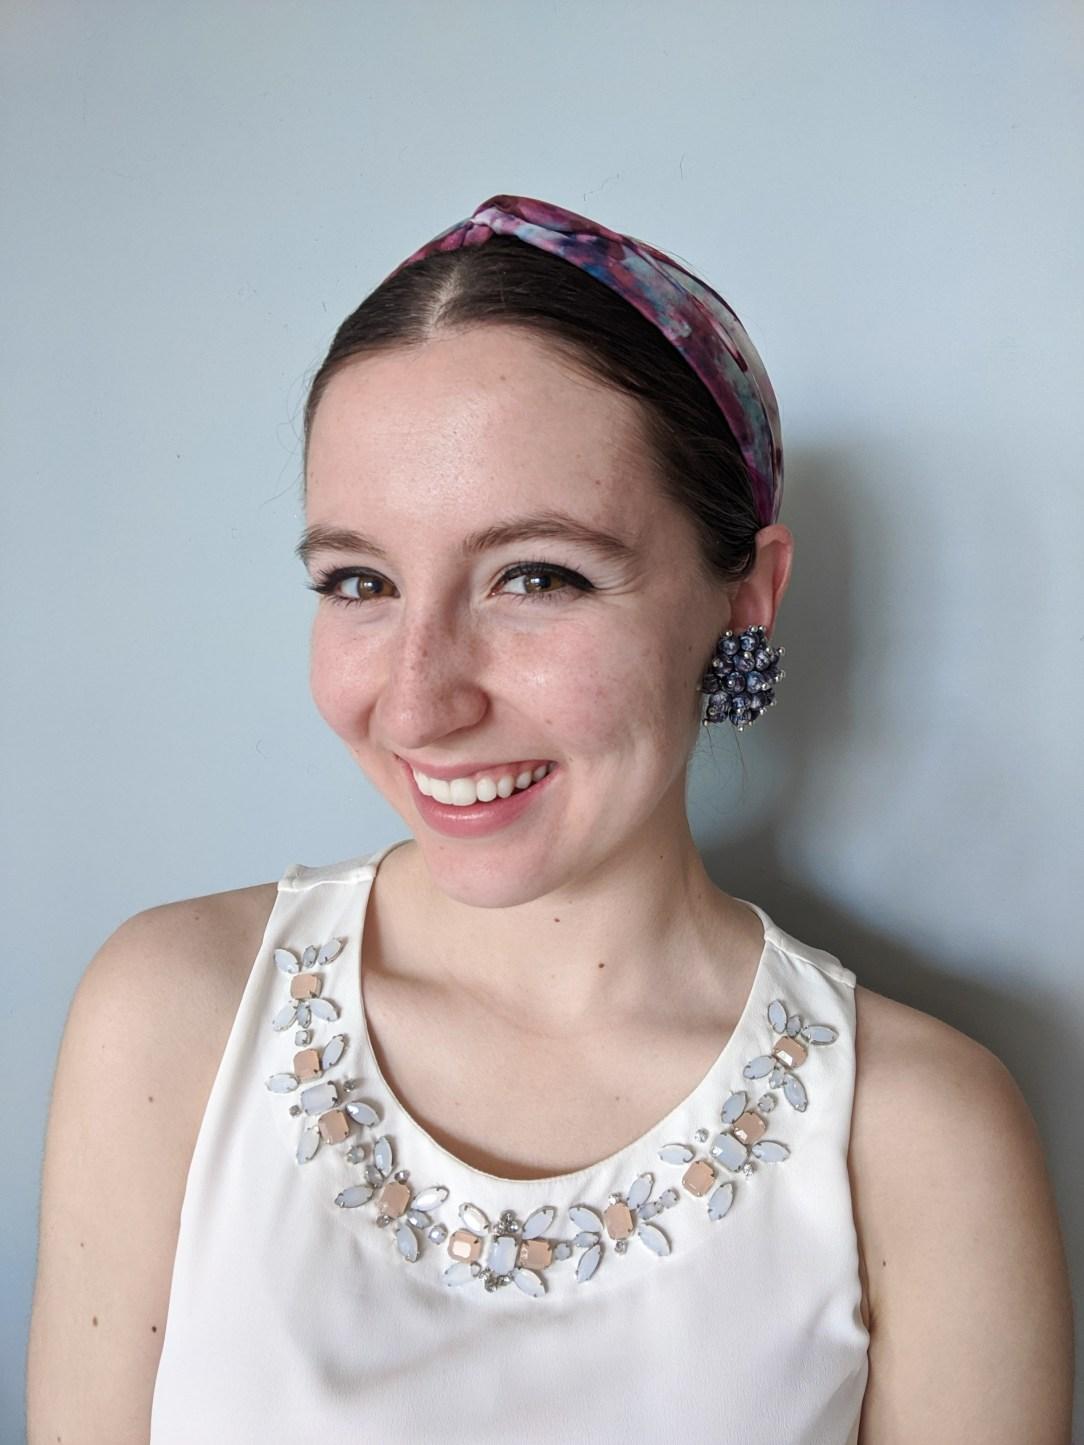 clip-on earring, bedazzled blouse, quarantine hair, third day hair